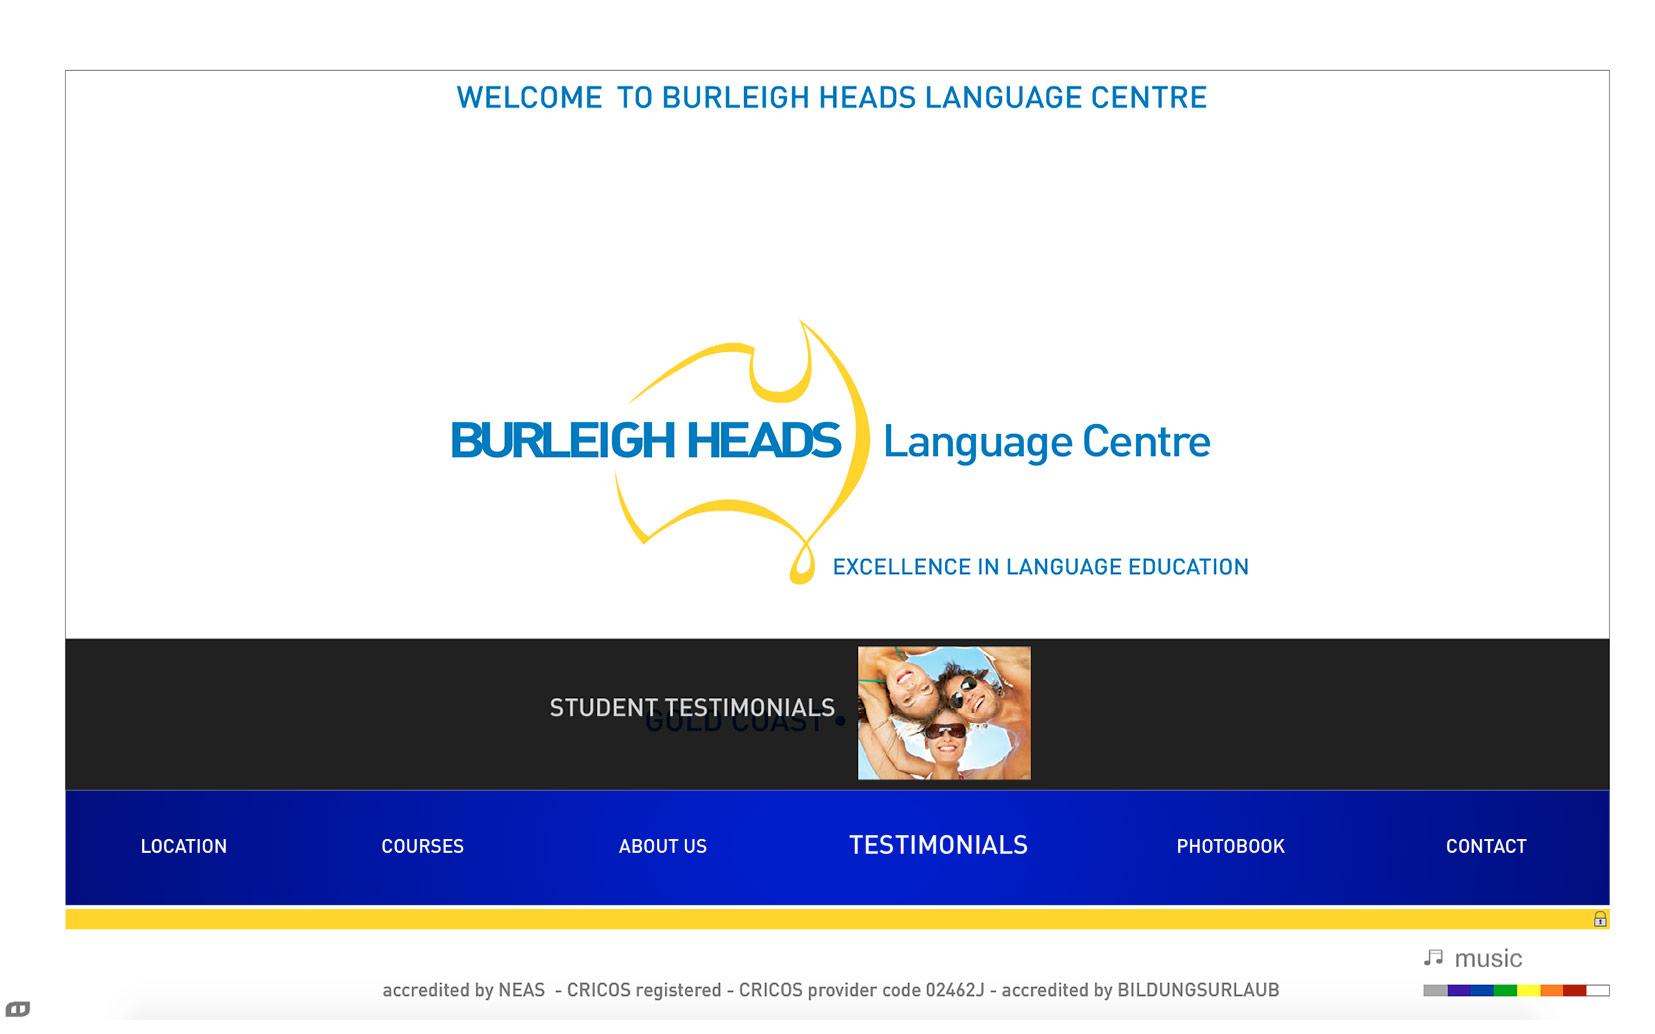 Burleigh Heads Language Centre